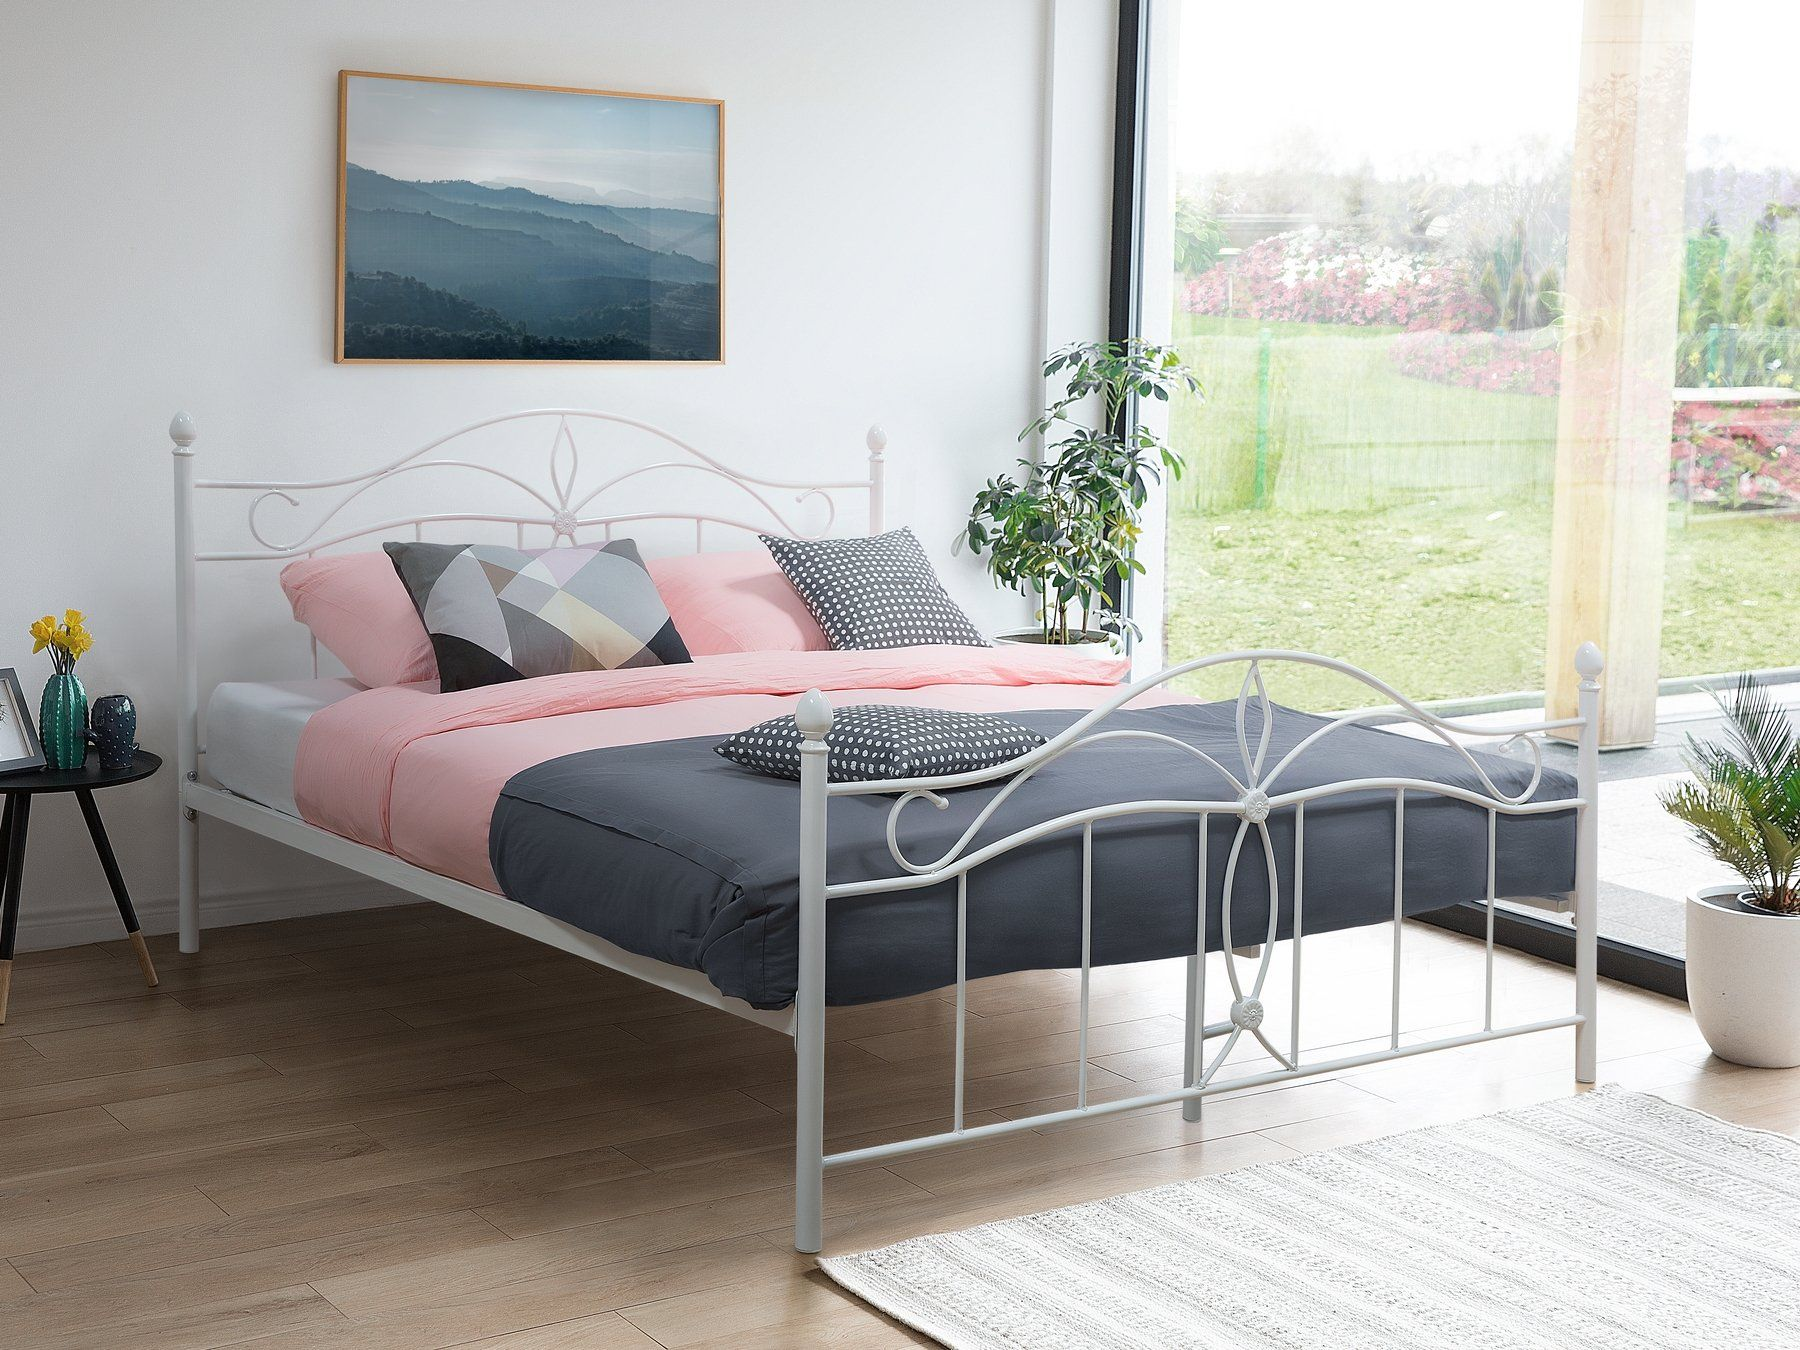 Metal EU King Size Bed White ANTLIA King size bed frame